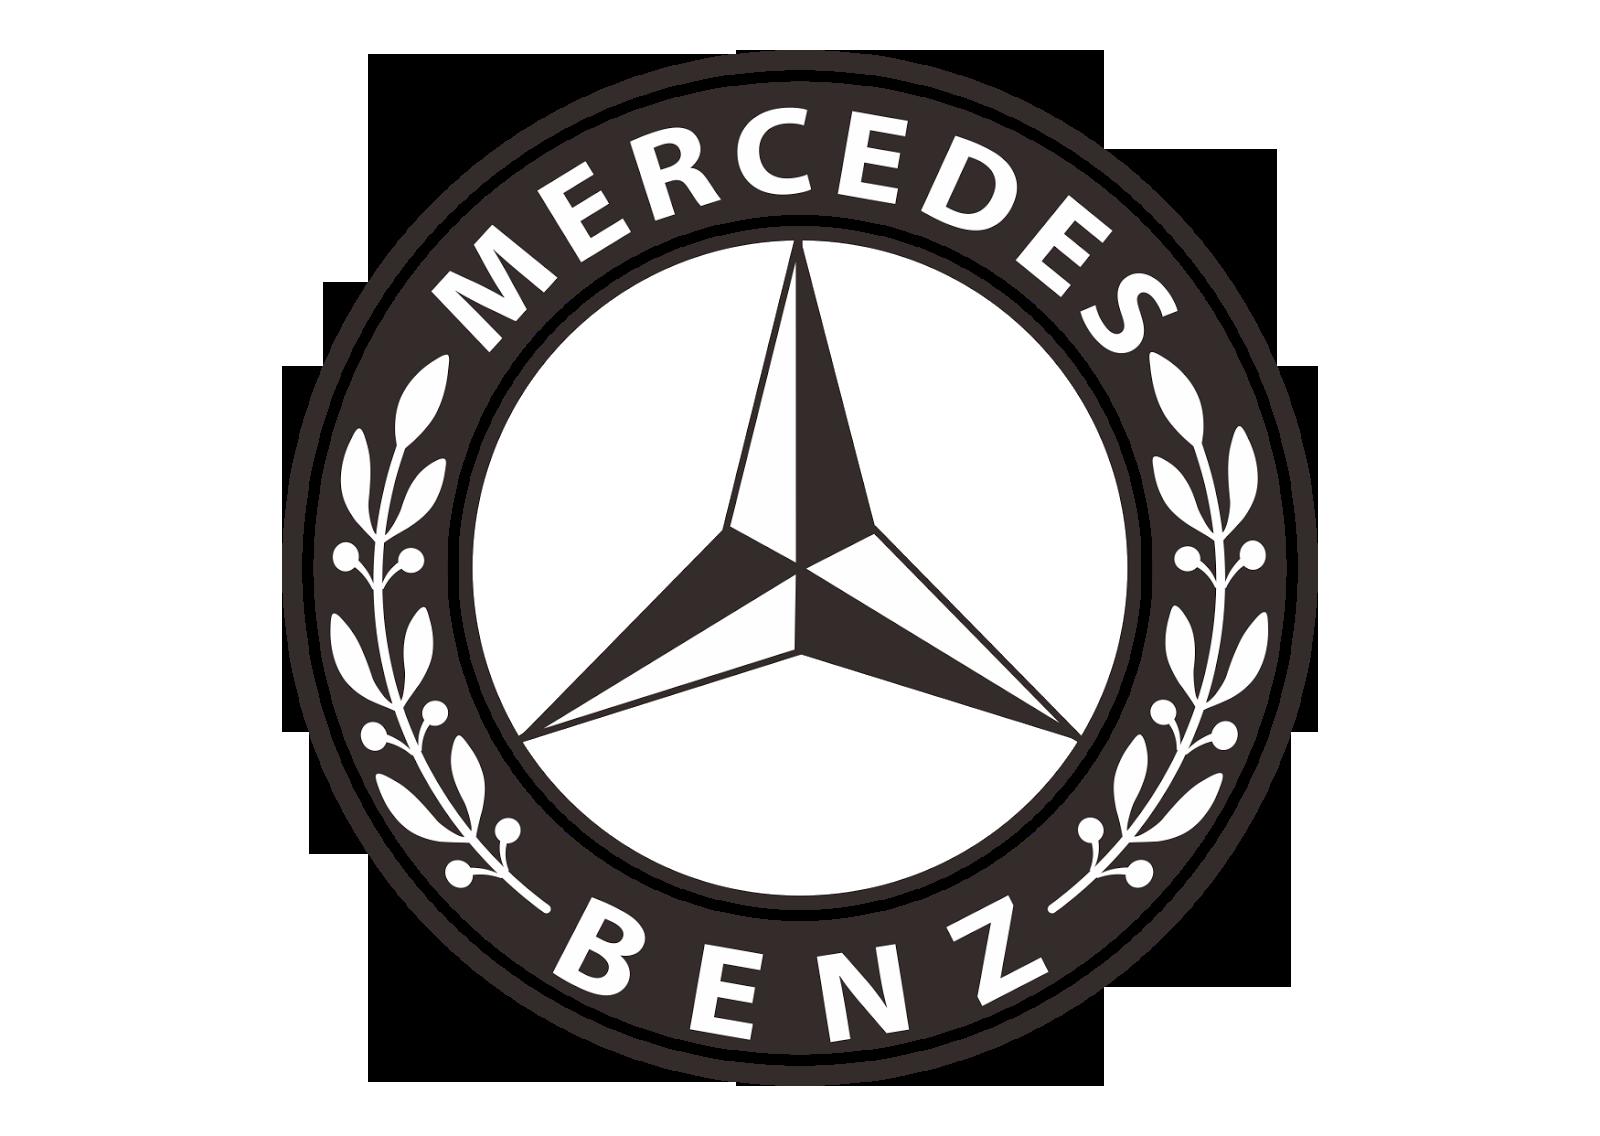 Mercedes benz logo clipart.